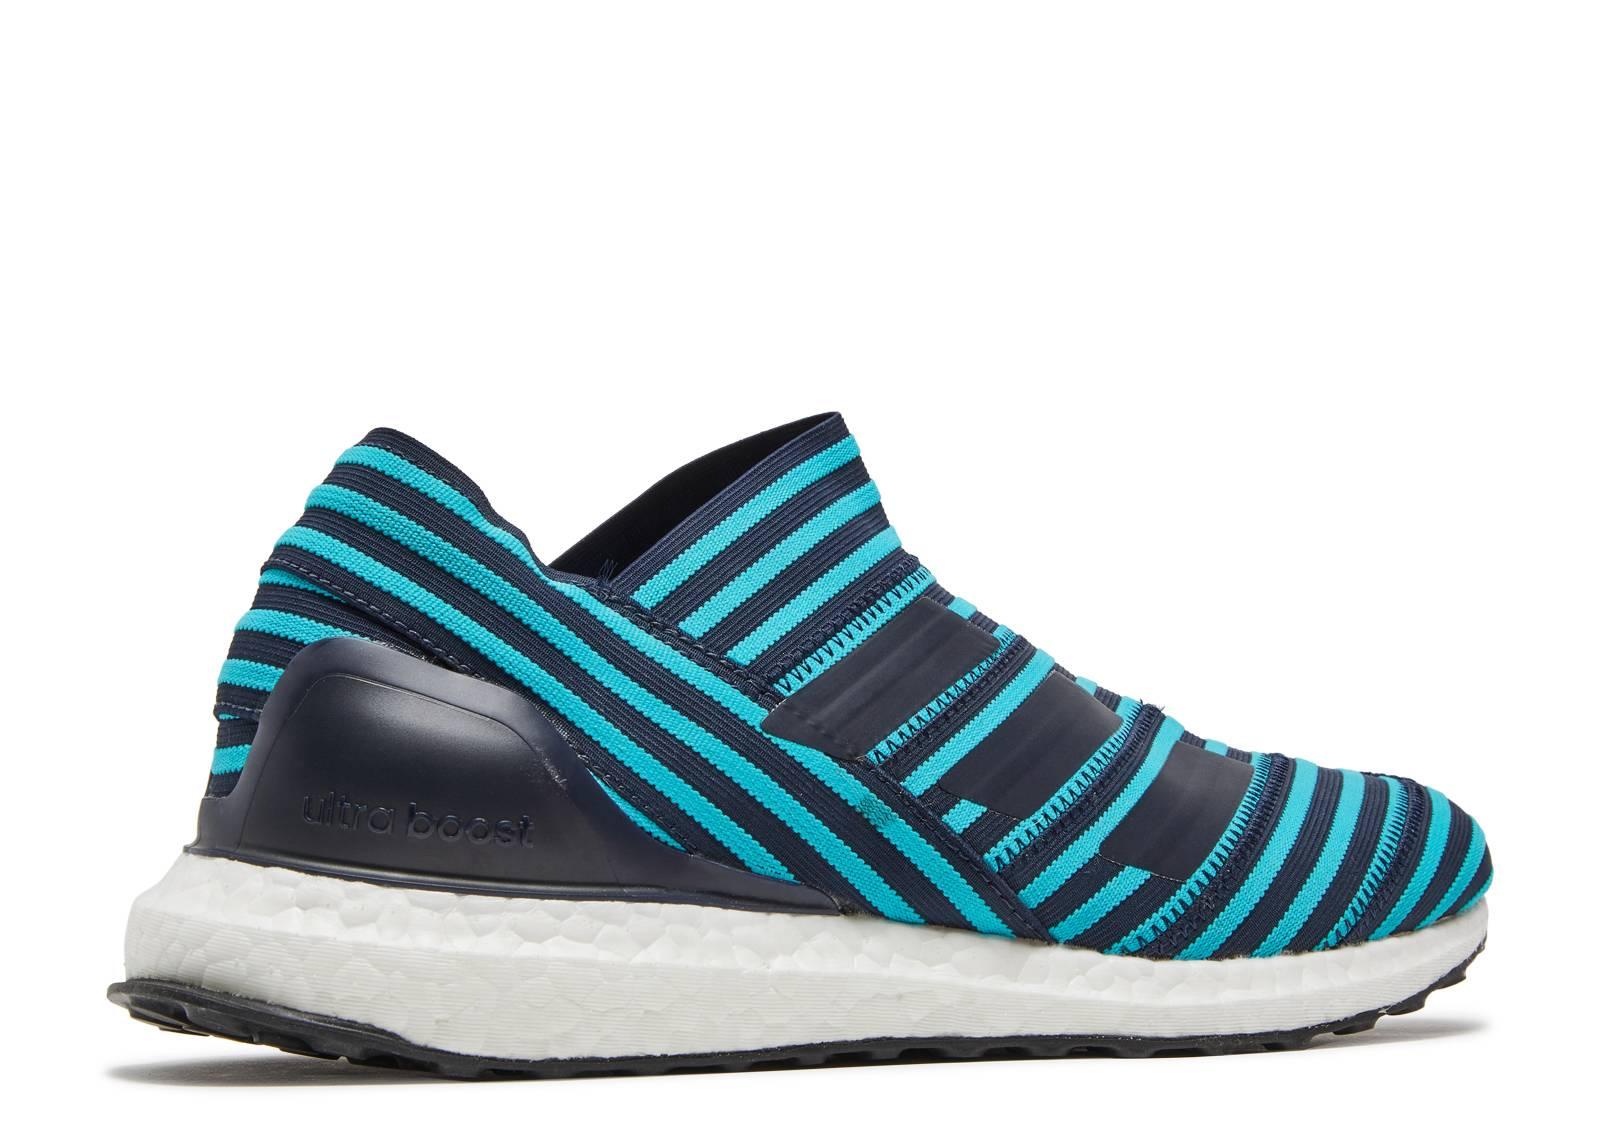 5c331132a6eb8 Nemeziz Tango 17+ 360 Agili - Adidas - CG3658 - legend ink   legend ink    energy blue